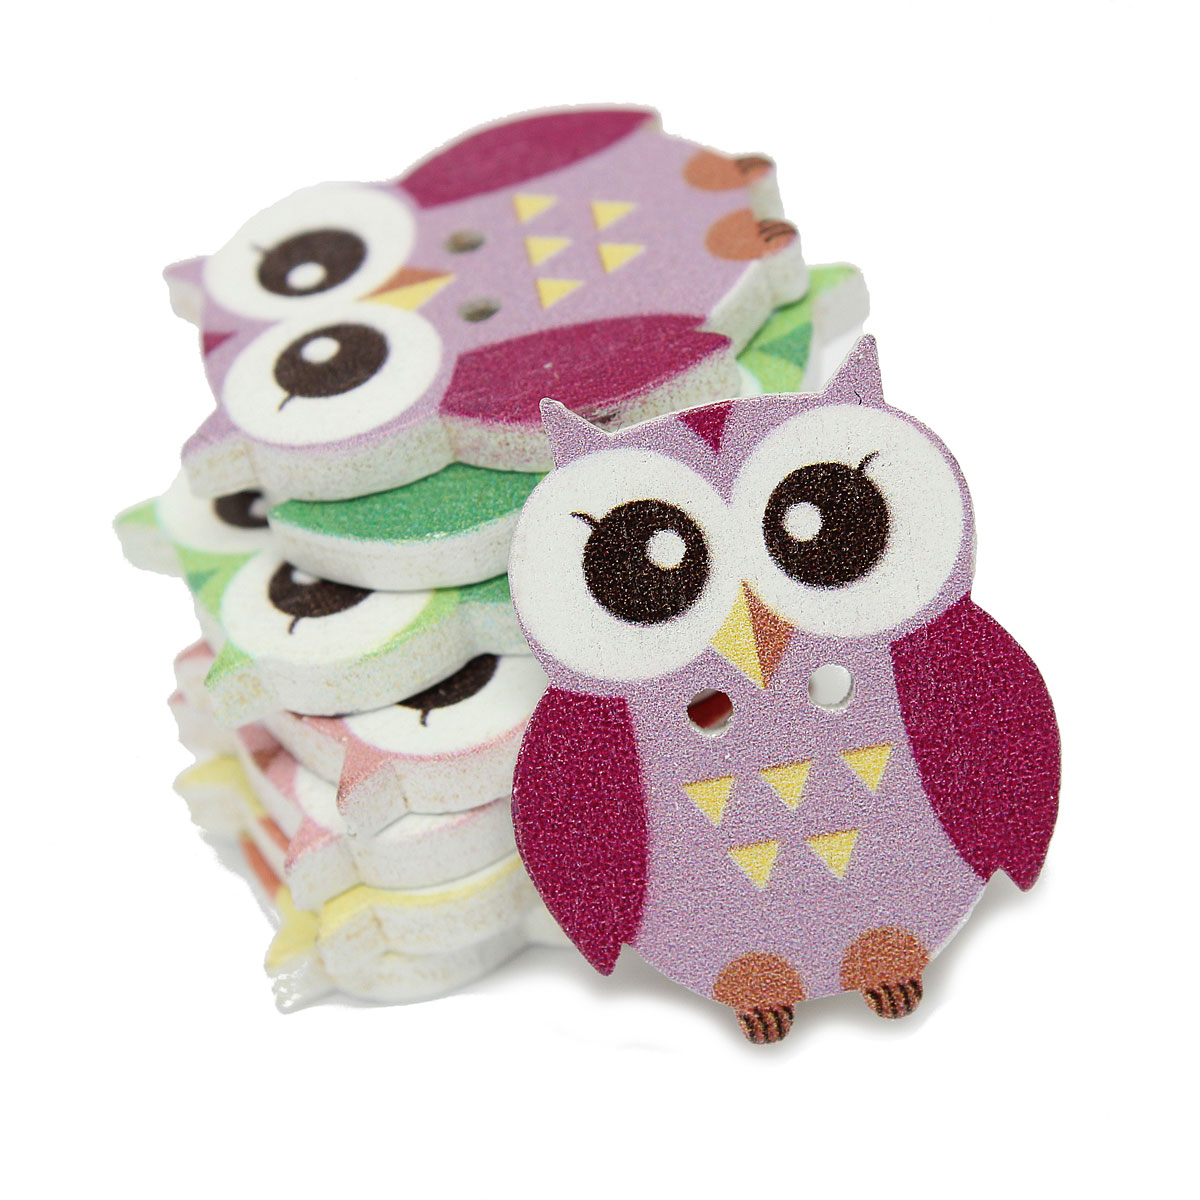 Handmade Owl Buttons Sewing Buttons 34 = 20 mm. 8 Assorted Owl buttons